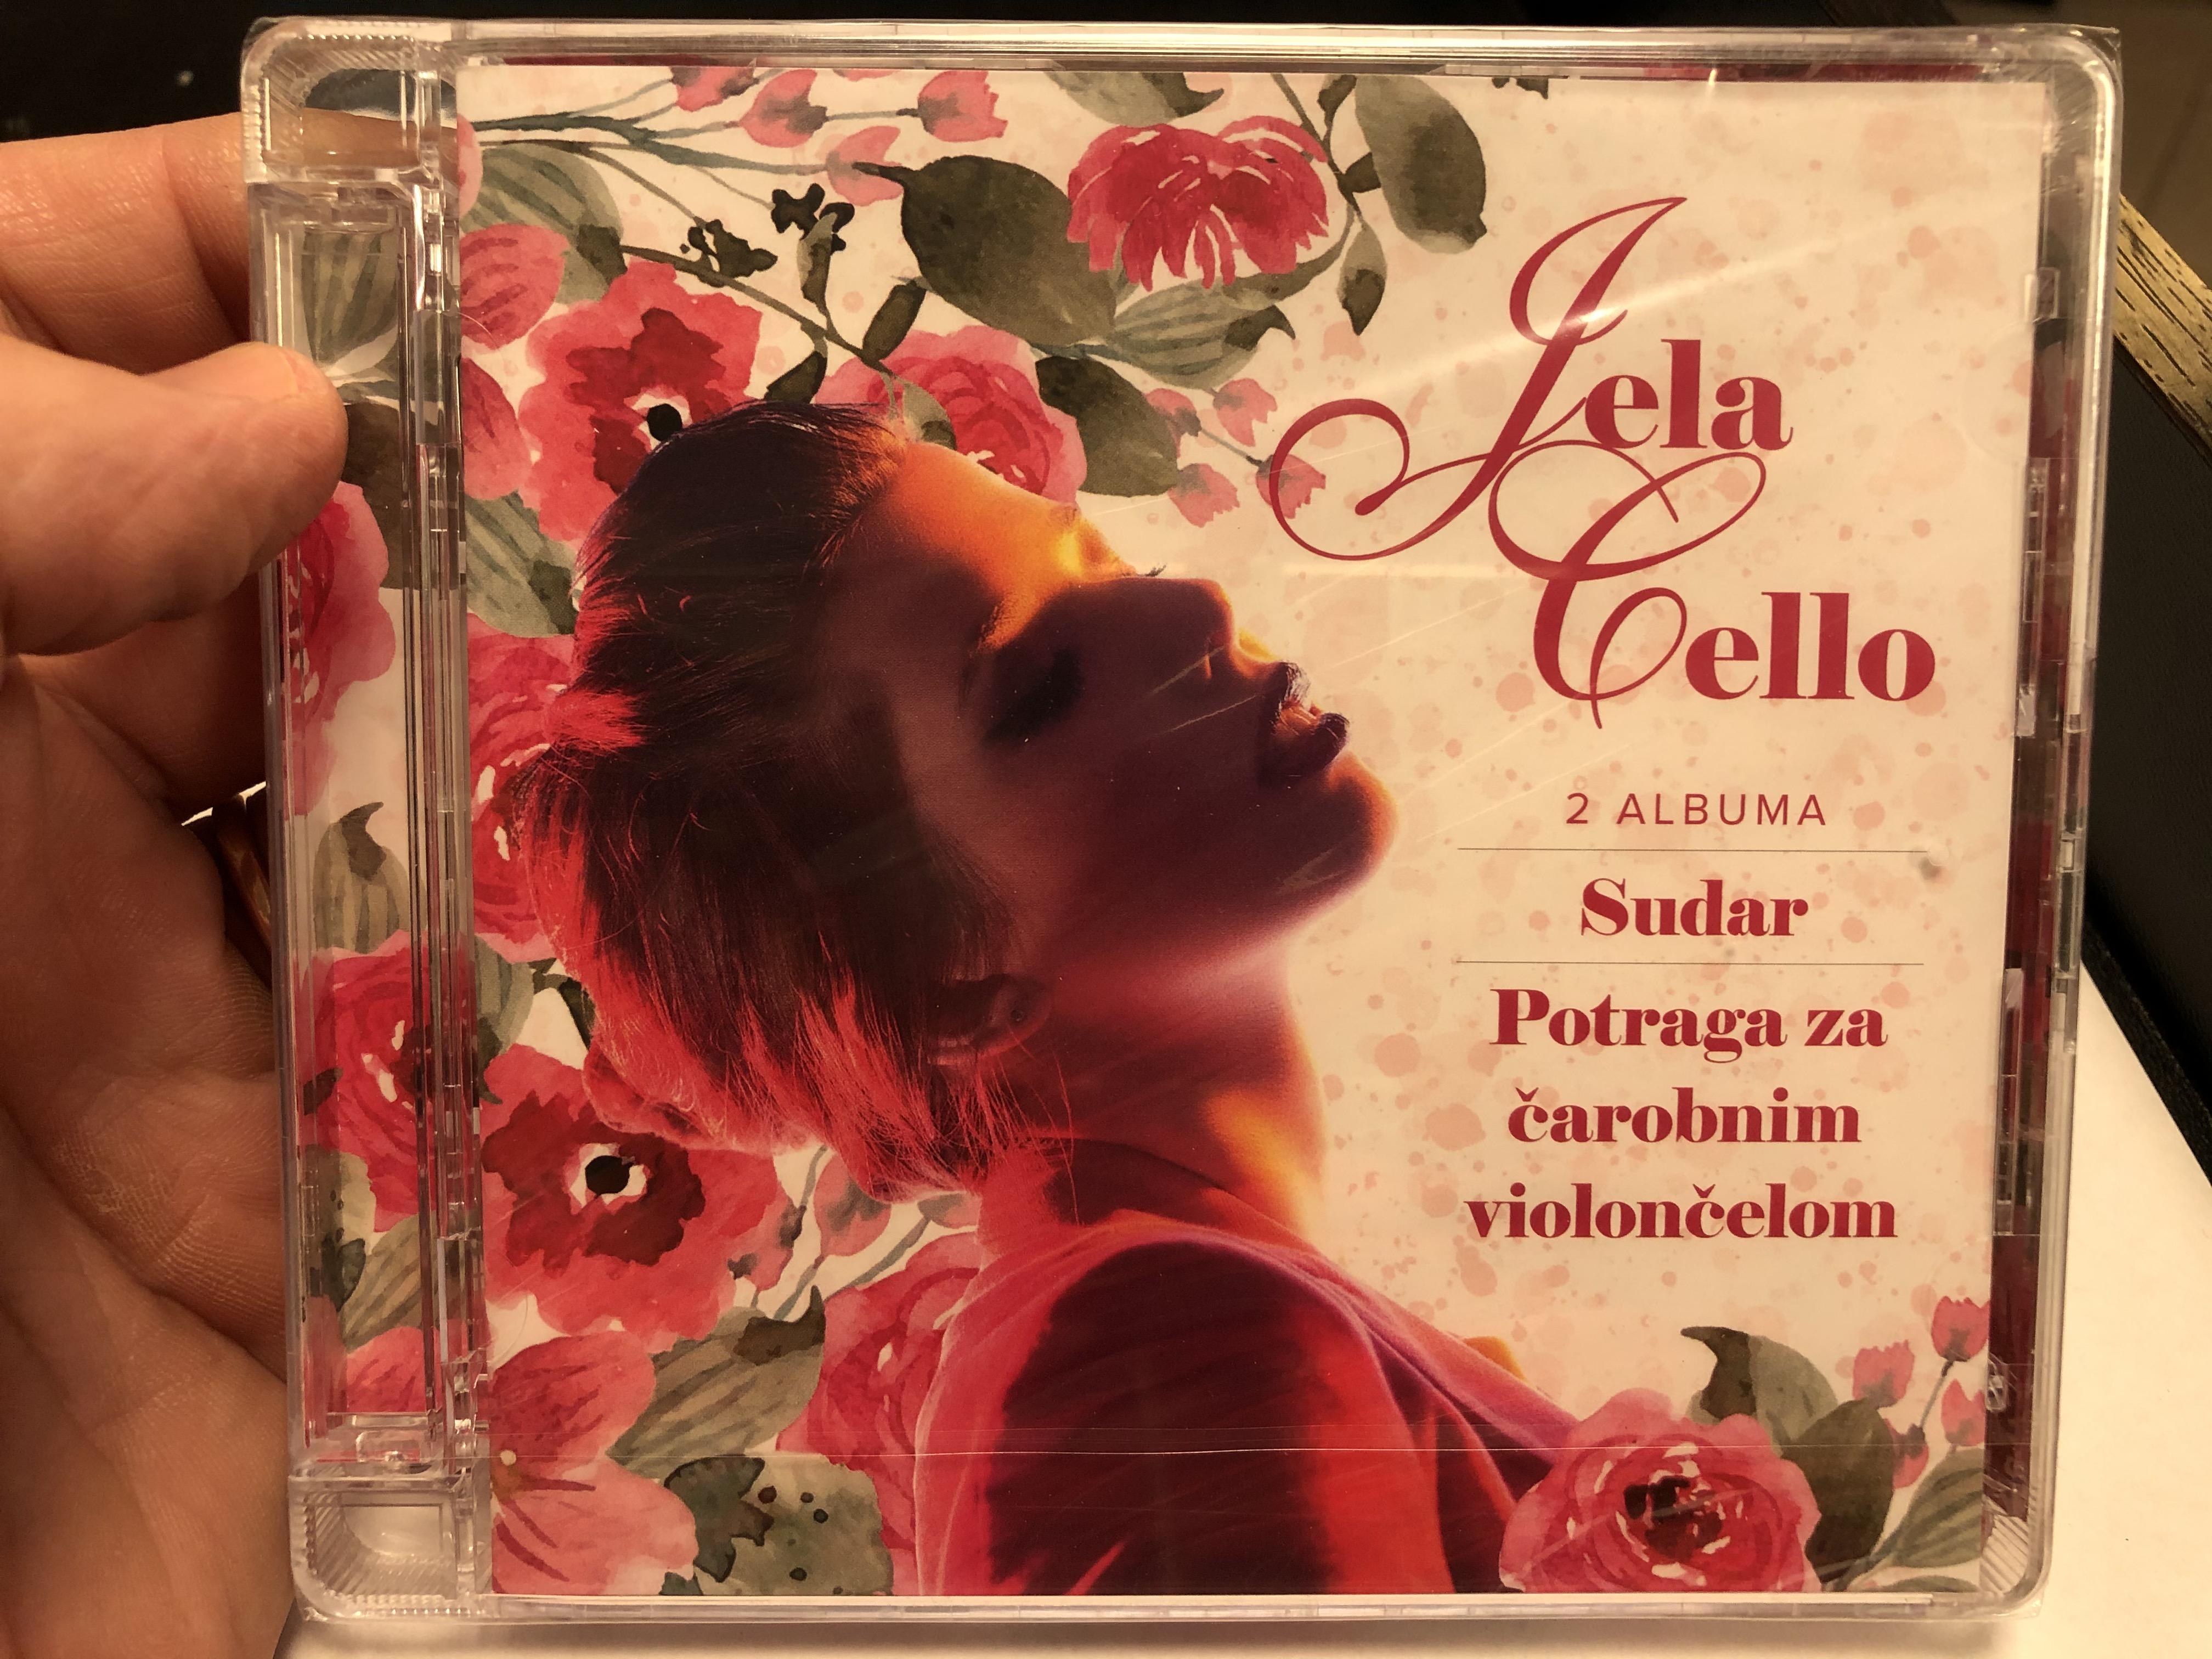 jela-cello-2-albuma-sudar-potraga-za-arobnim-violon-elom-croatia-records-2x-audio-cd-2019-2cd-6090884-1-.jpg